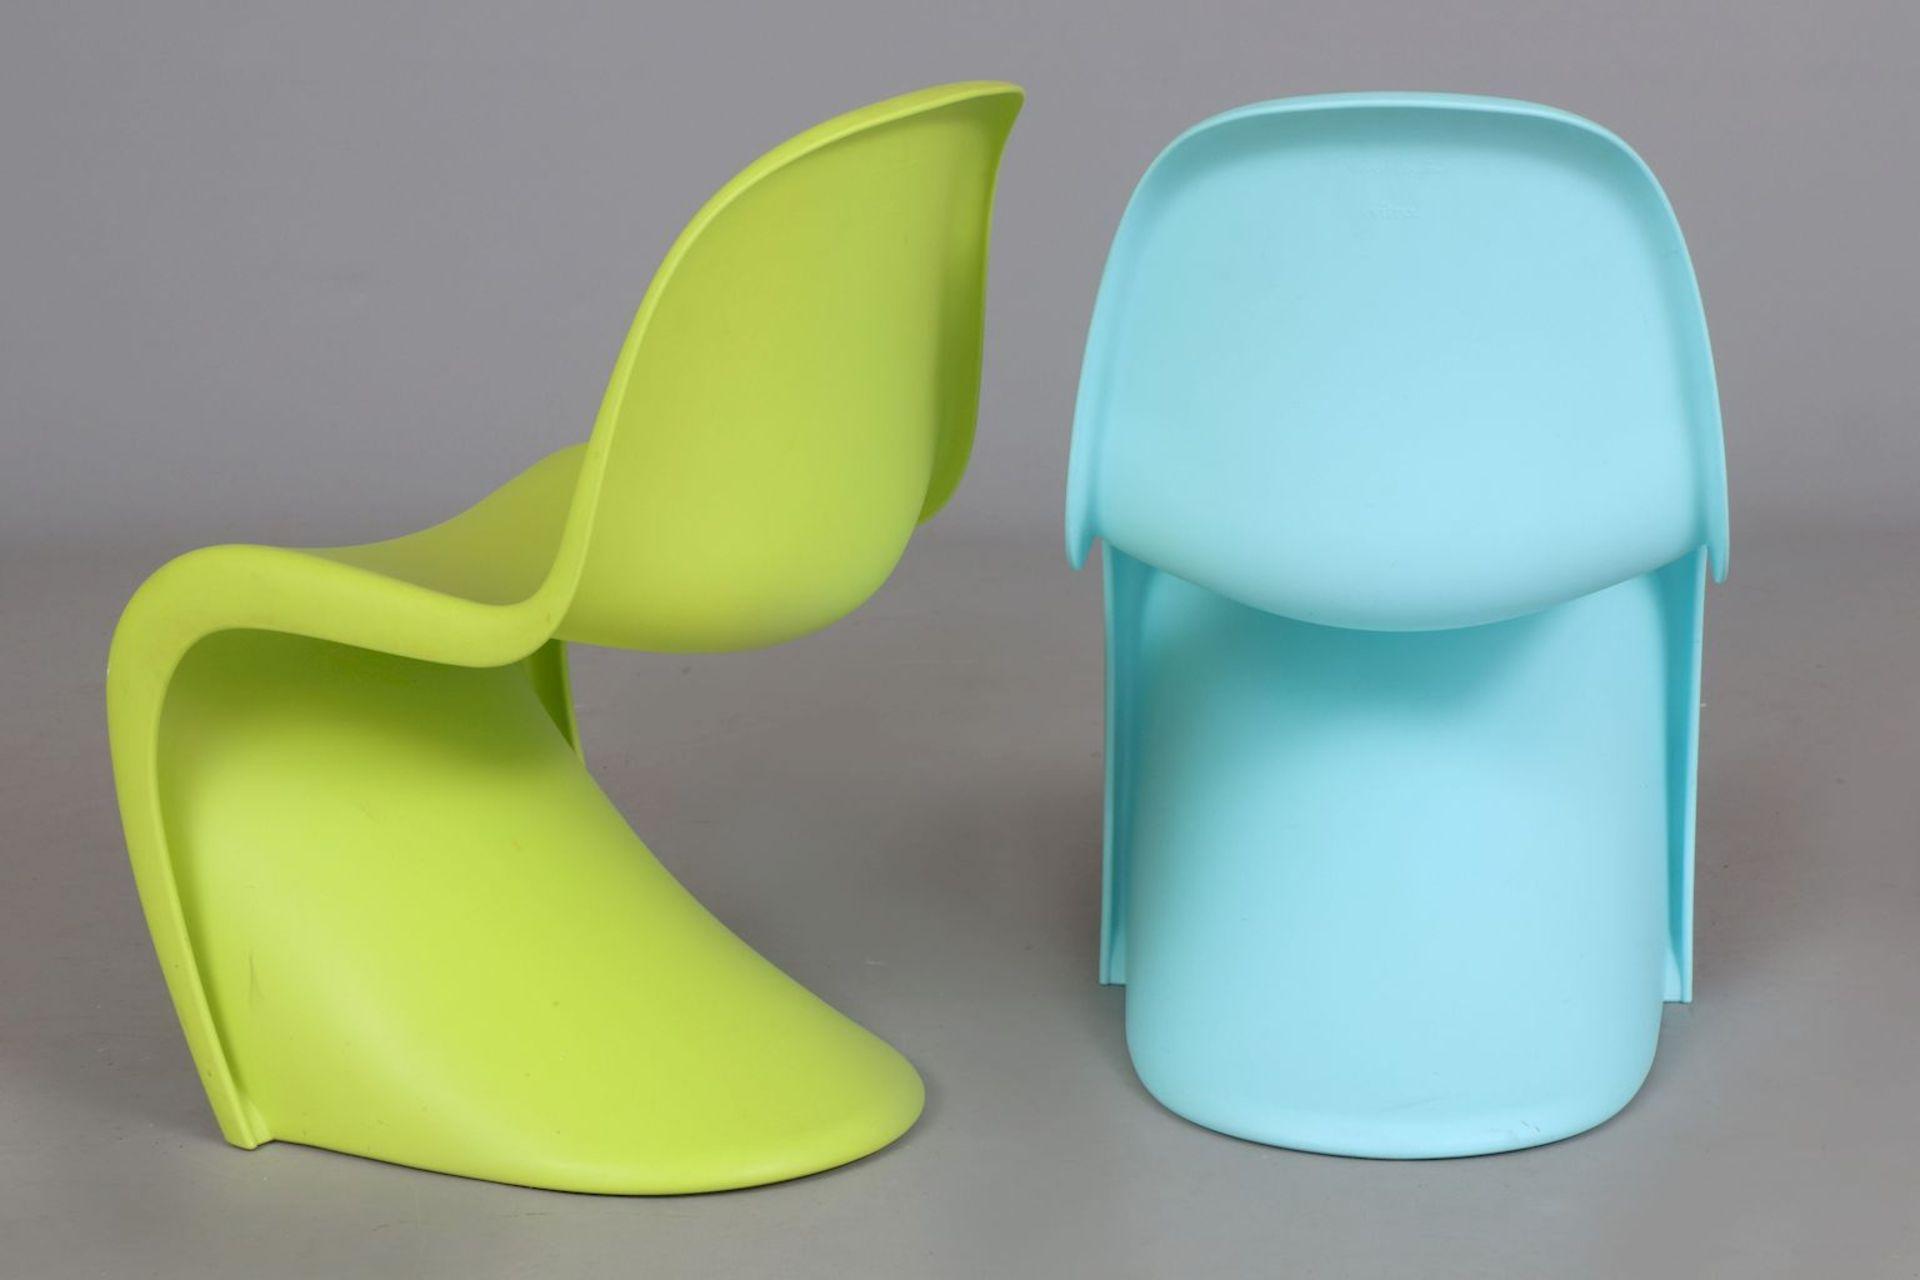 2 VERNER PANTON Kinder (Junior) ¨Panton Chairs¨ - Image 4 of 5